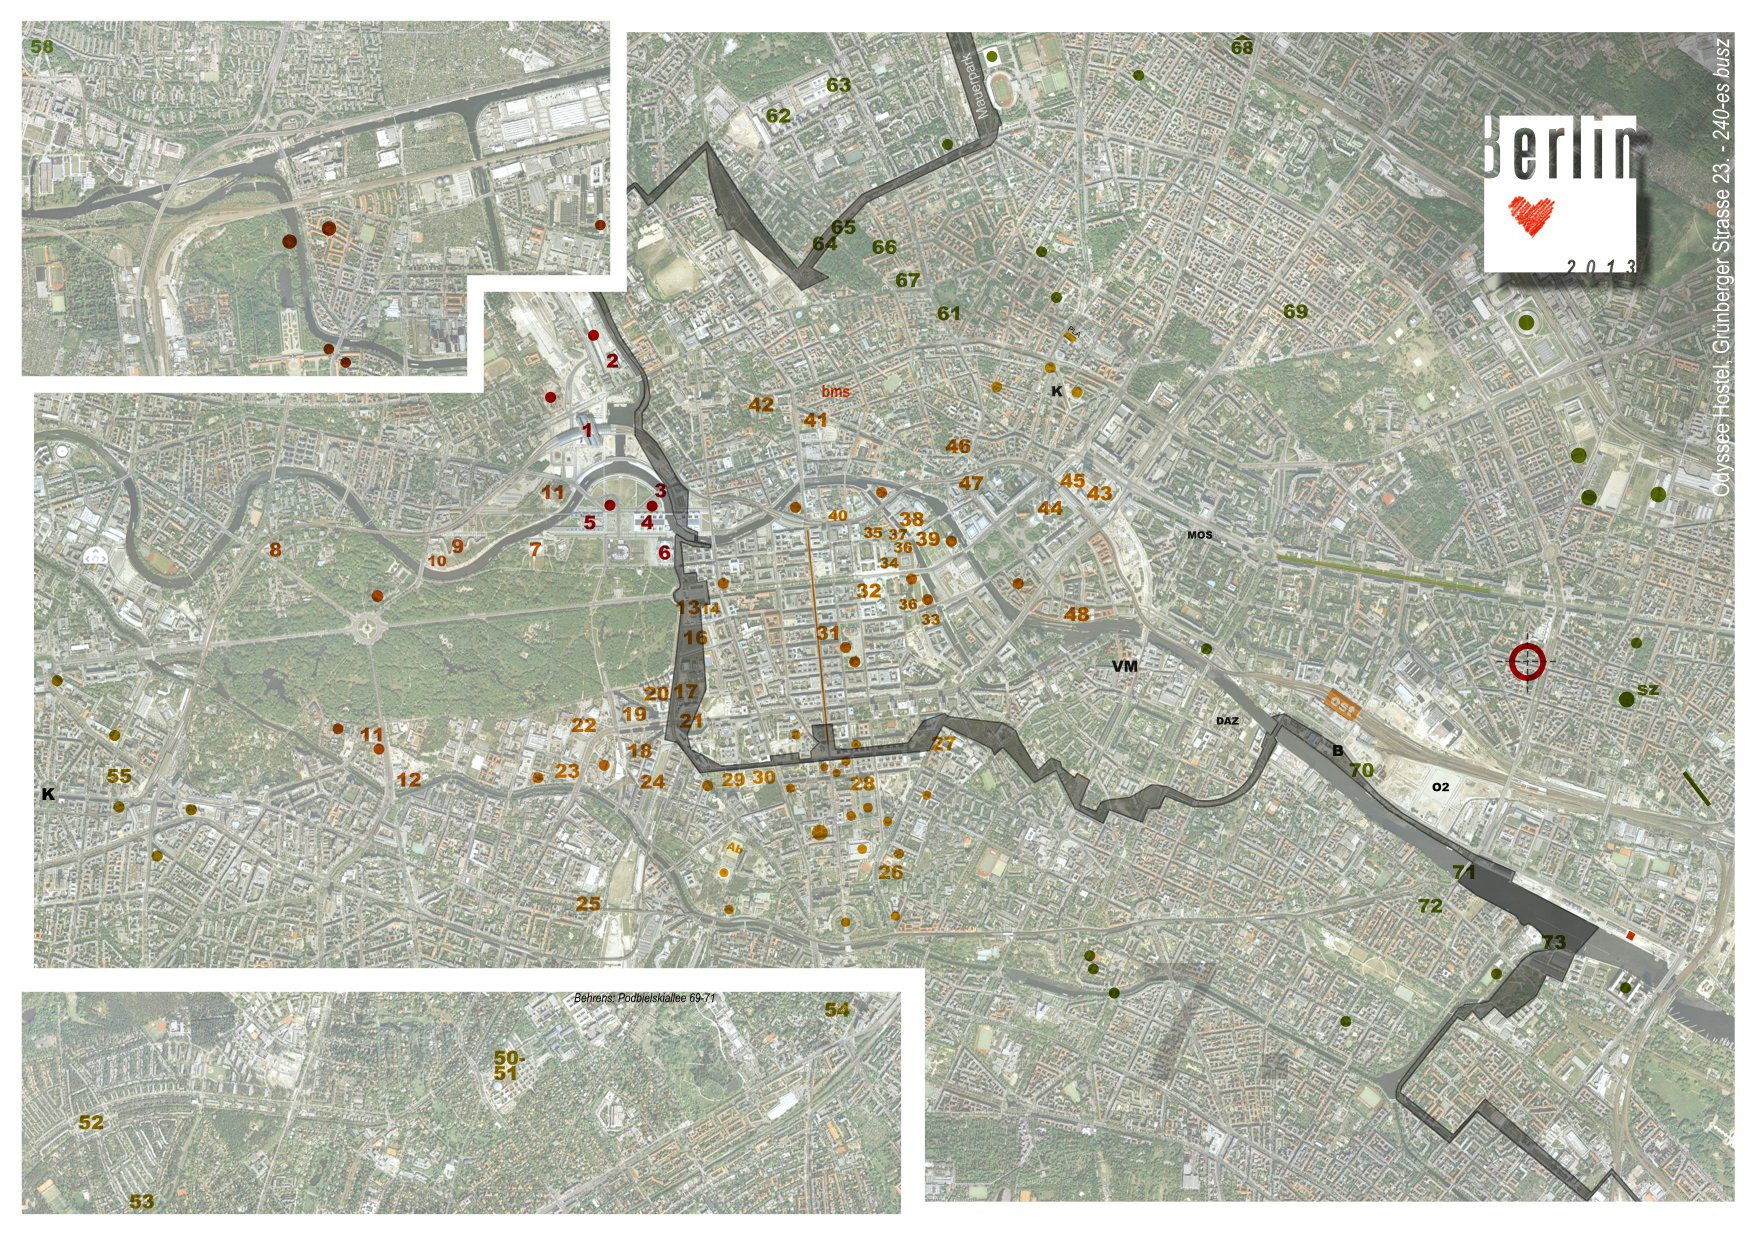 Berlin térkép 2013c.jpg